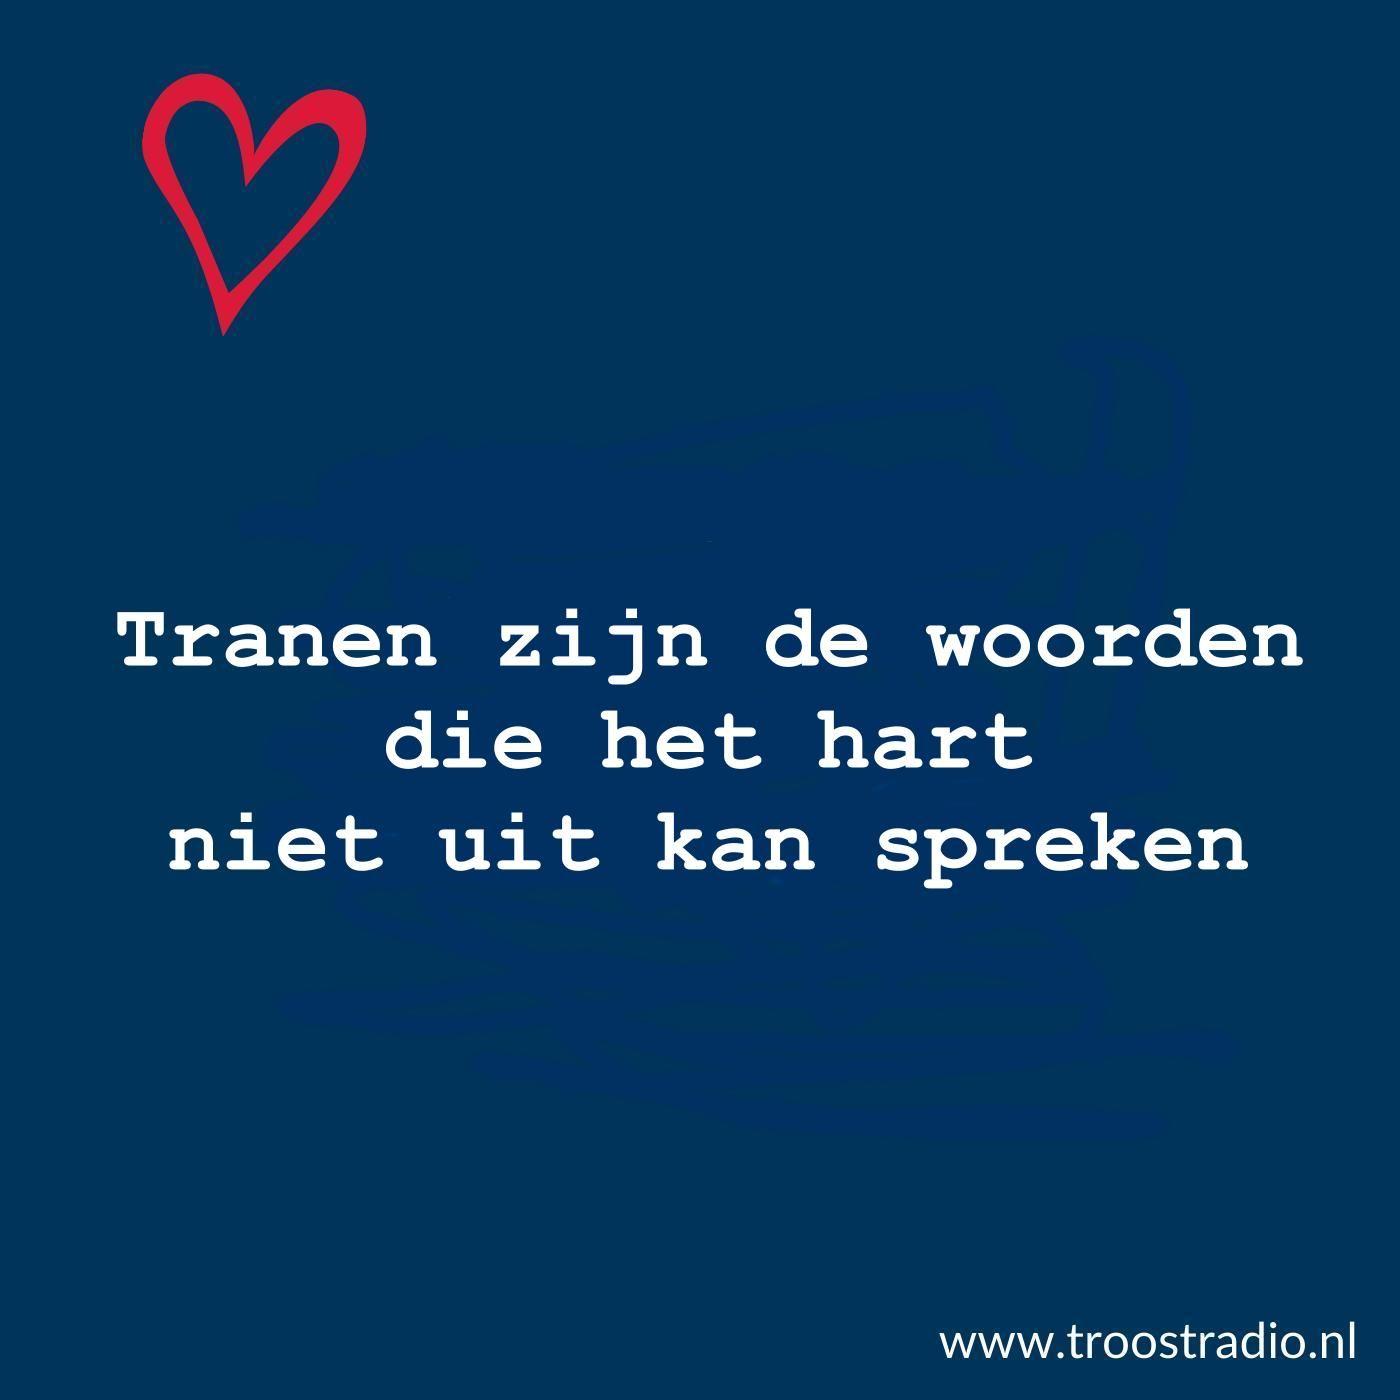 Troostradio.nl - Muziek Collage 049